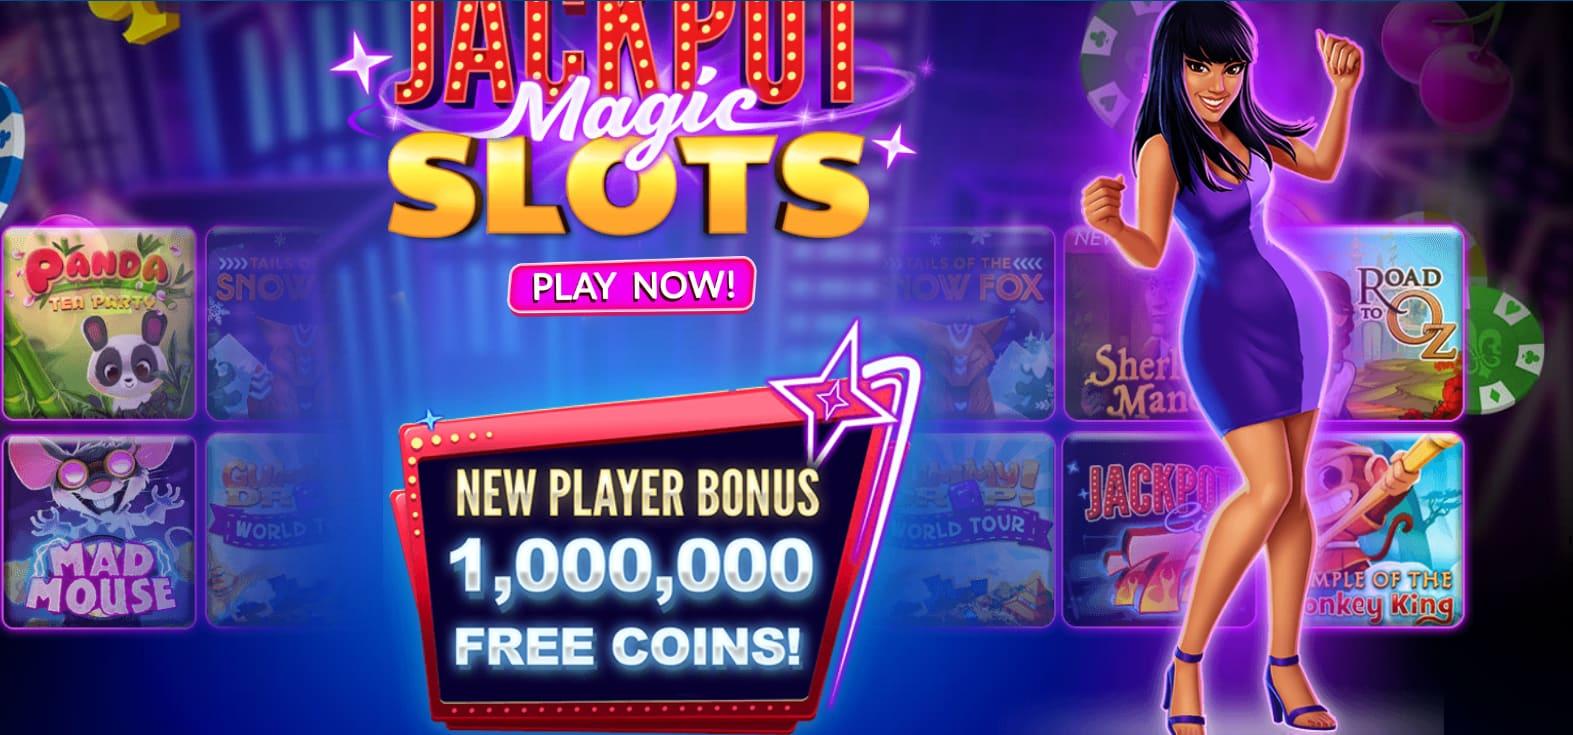 Welcome Bonus – Get 1,000,000 Jackpot Magic Slots